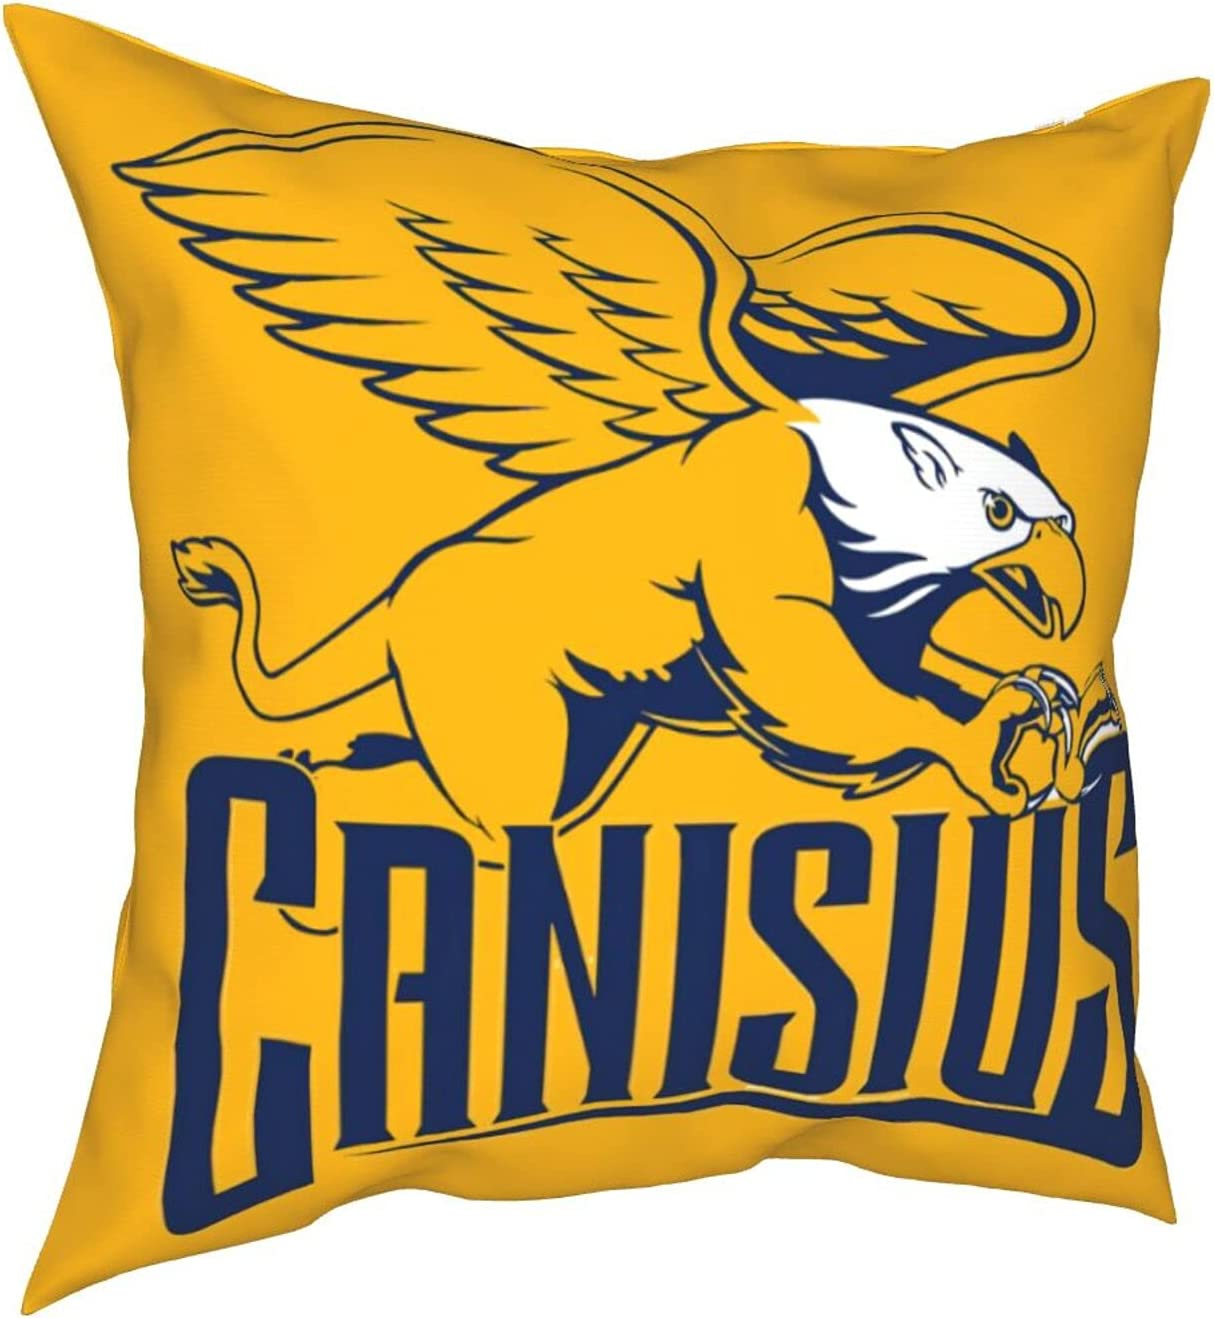 JEPLEEGO Canisius Tucson Mall College Golden Cove Pillow Throw Gri-Ffins [Alternative dealer]